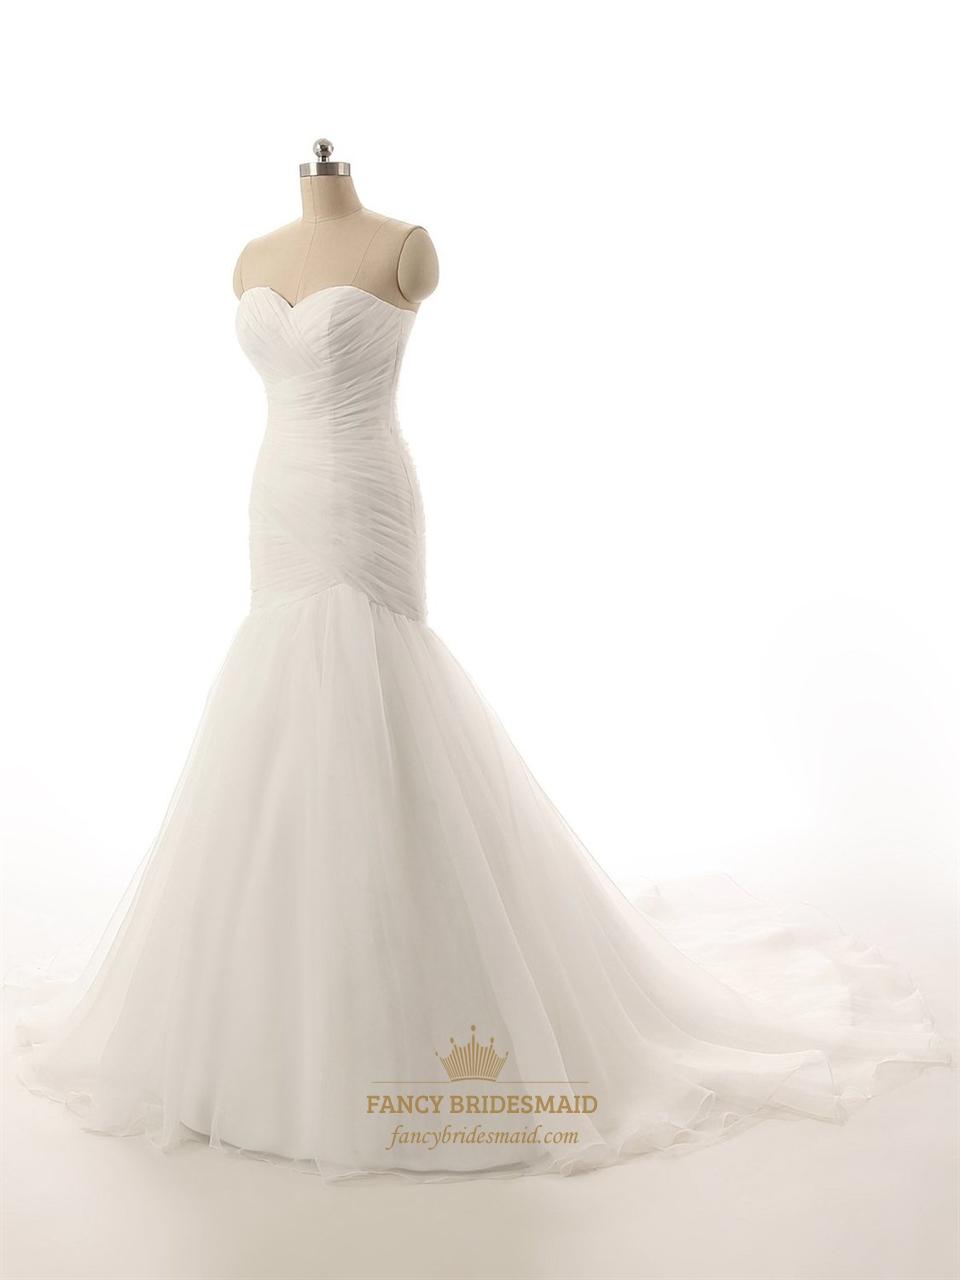 Mermaid Wedding Dress Train : Ivory strapless drop waist mermaid wedding dress with